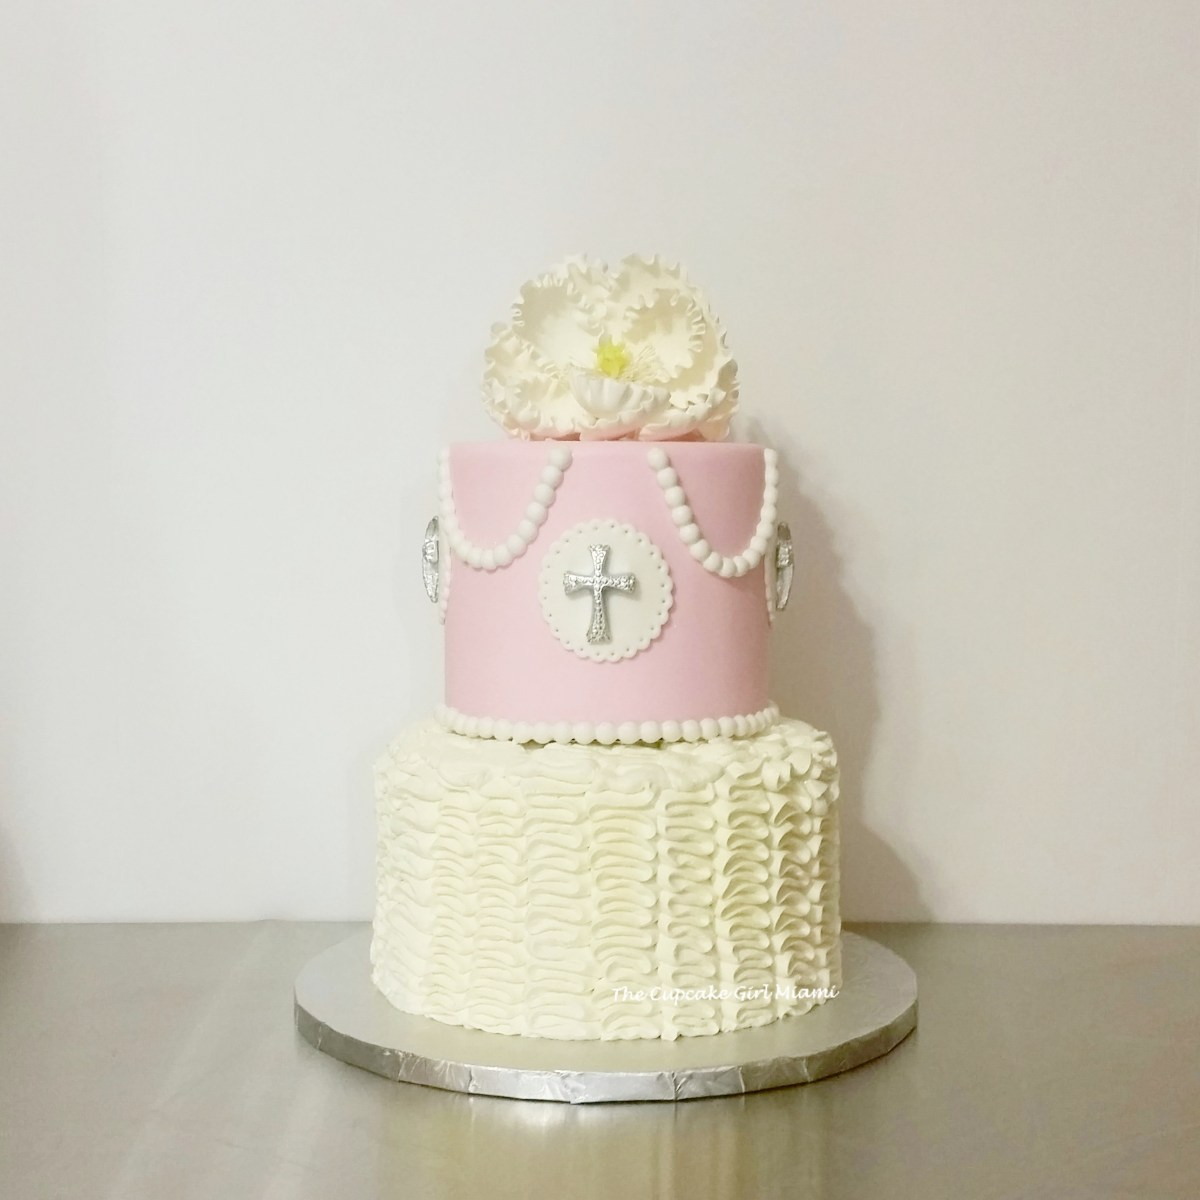 Baptism cake, Miami